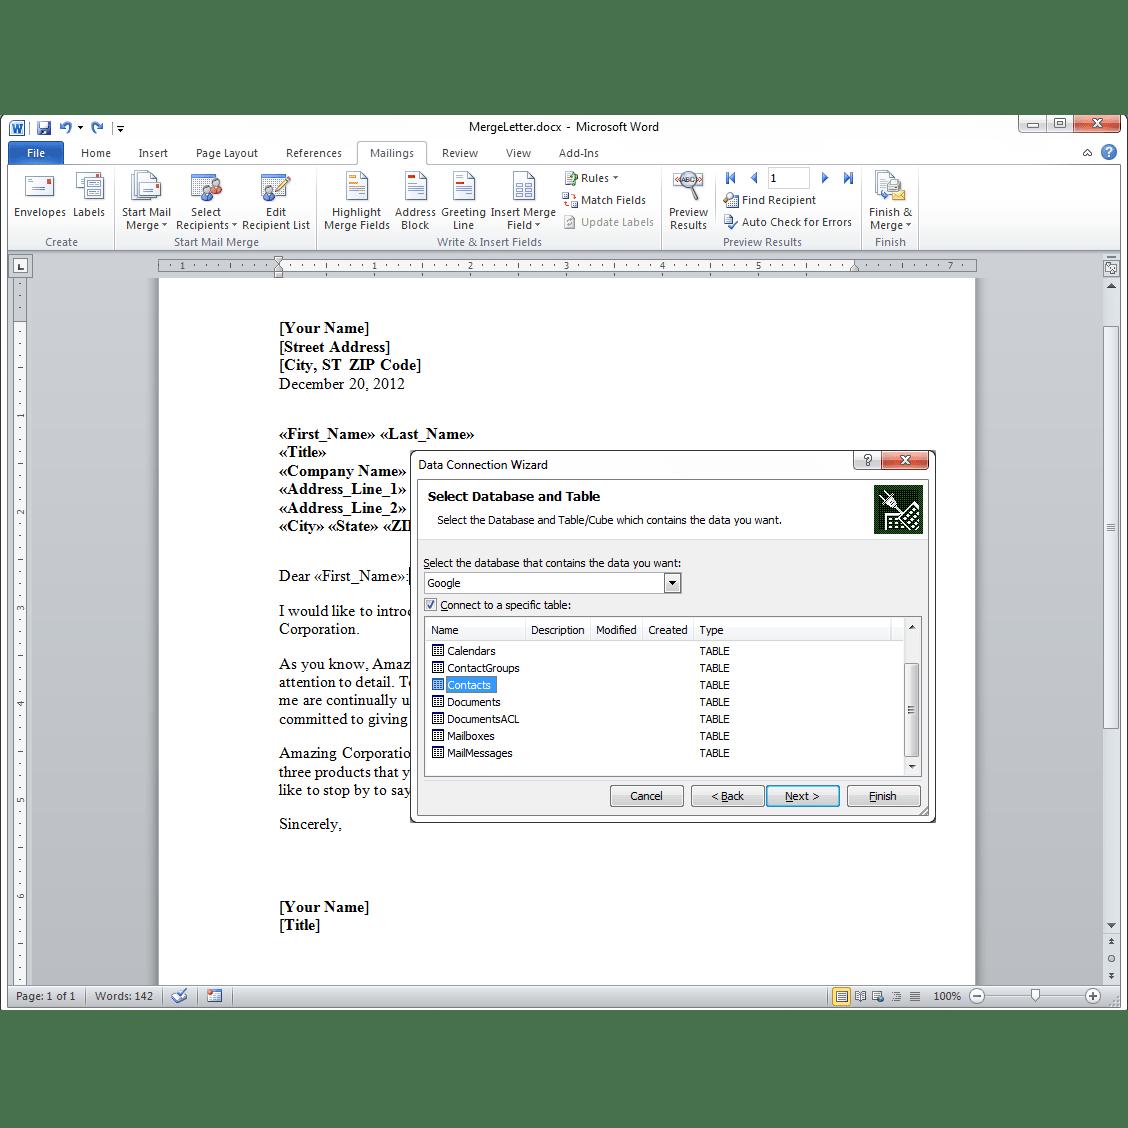 MailChimp ODBC Driver